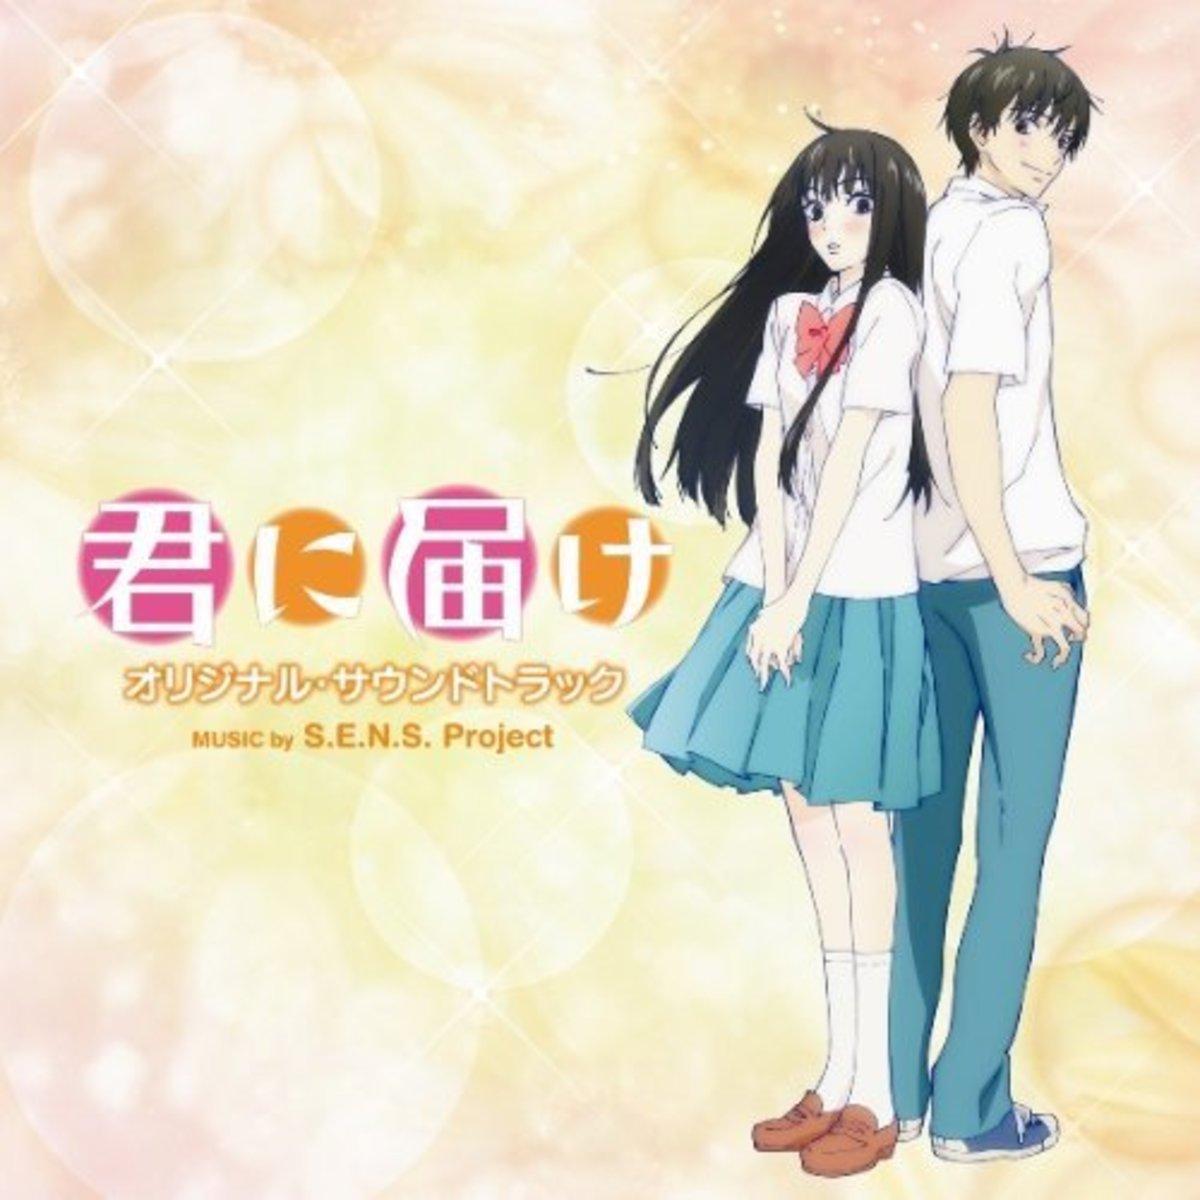 Kimi ni Todoke Anime Opening & Ending Theme Songs With